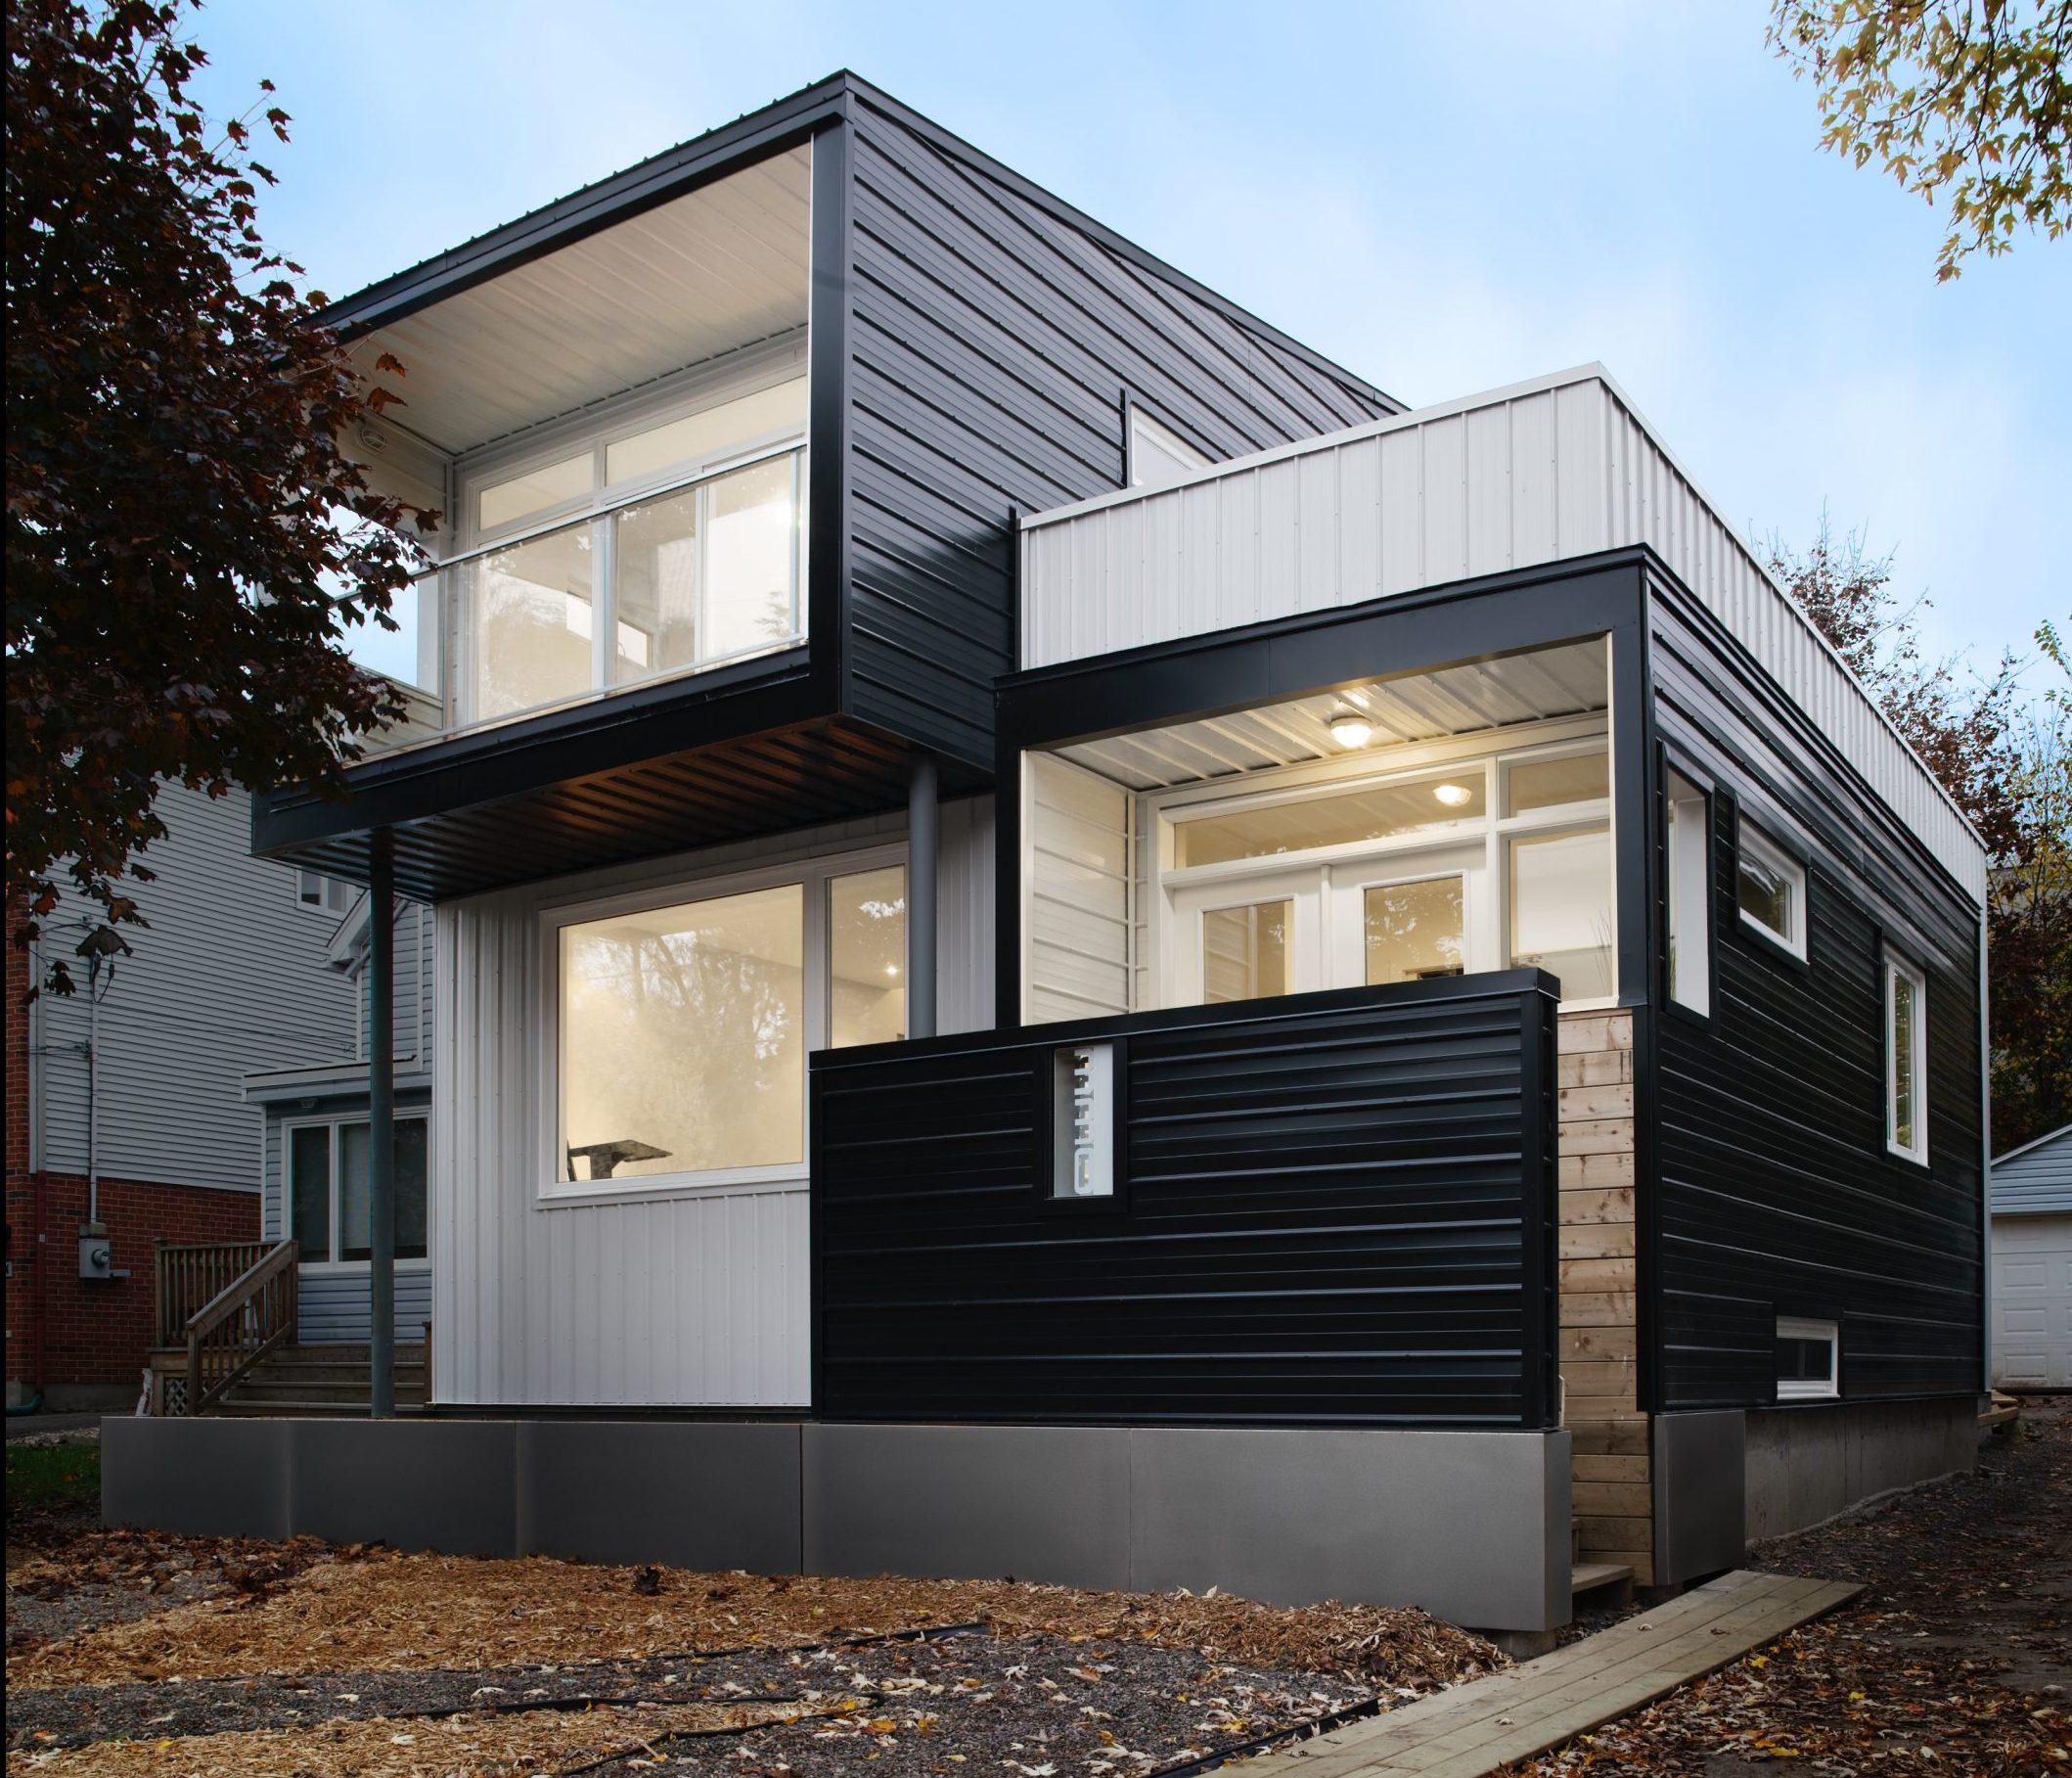 WINONA HOUSE FULL VIEW